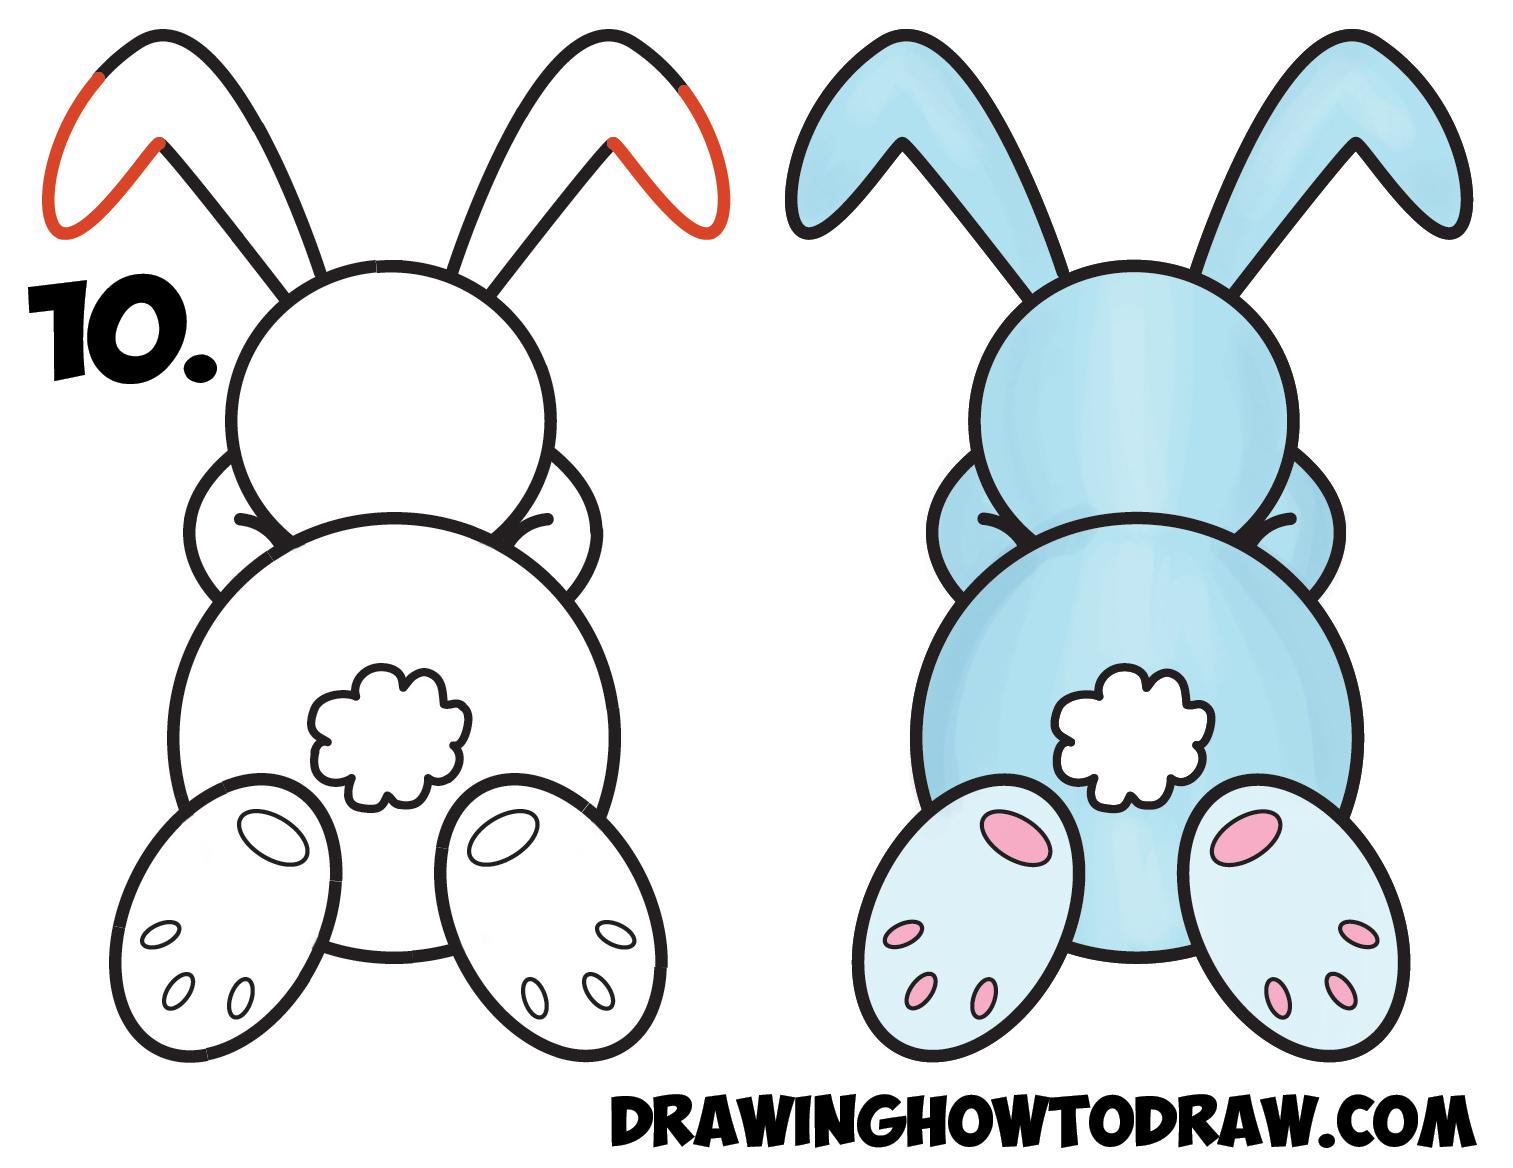 1513x1168 How To Draw A Cute Cartoon Sleeping Bunny Rabbit